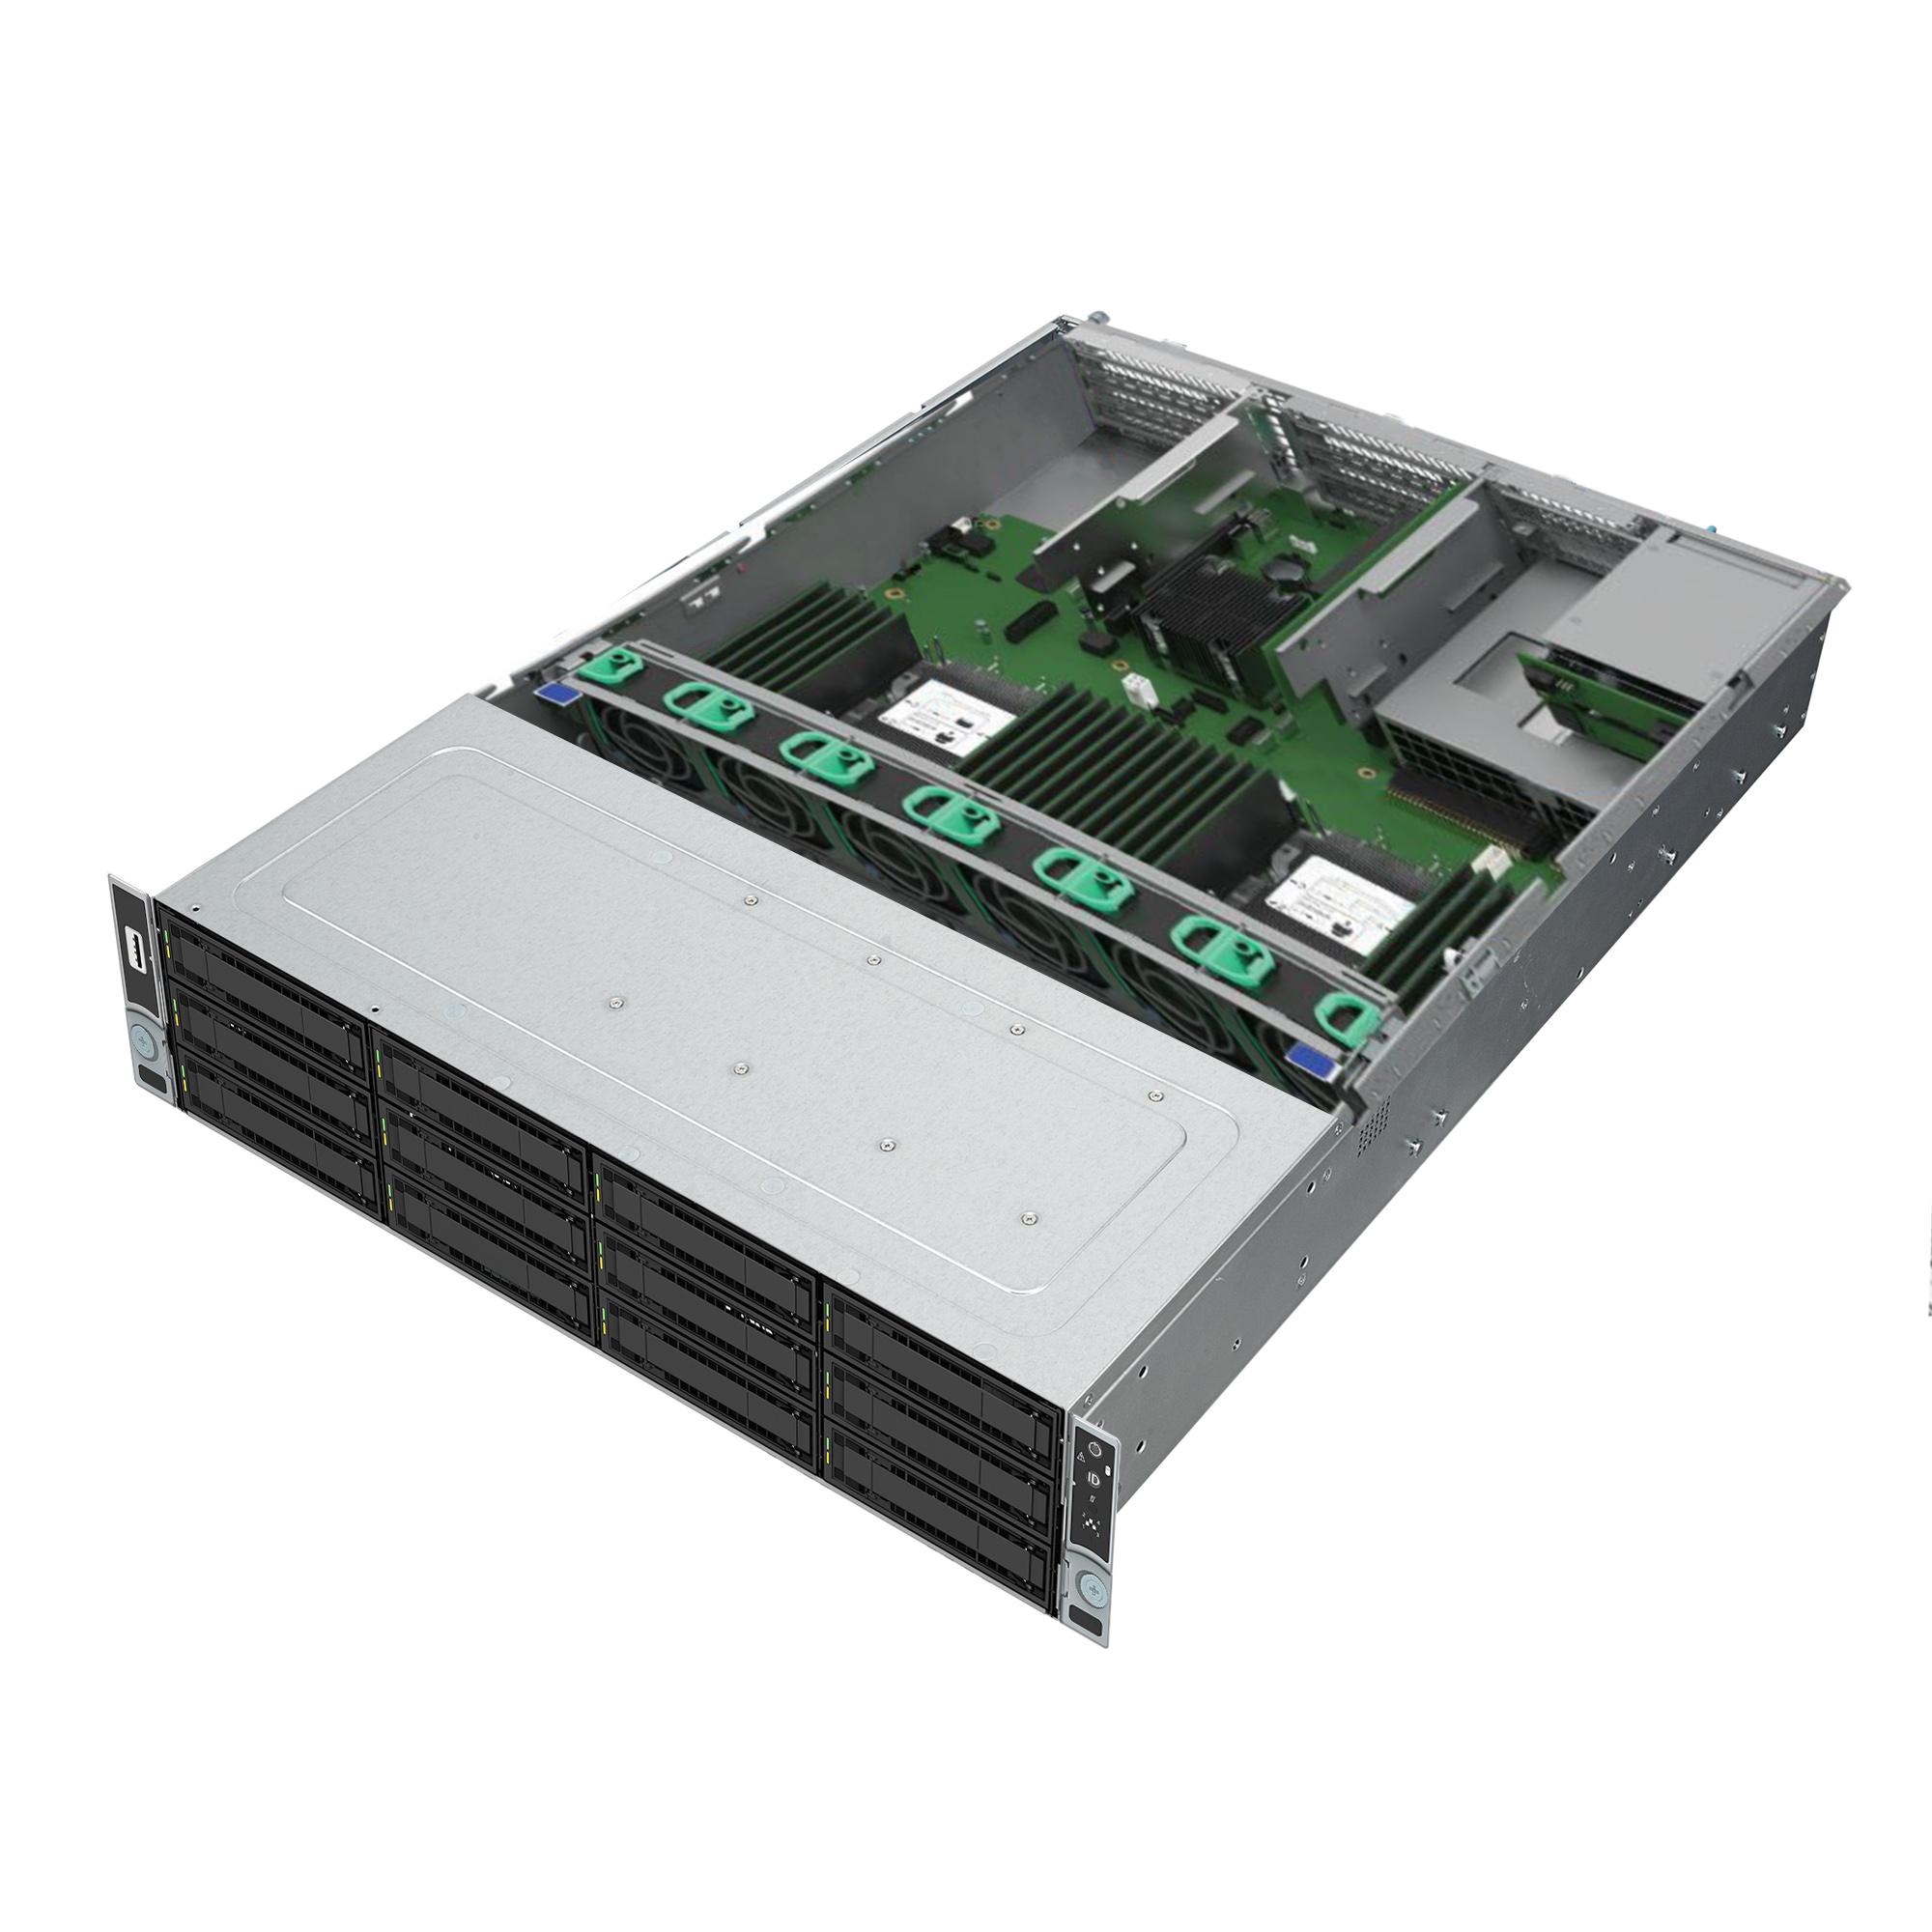 Extrema-Server-Rack-2U – Alto diago-Recuperato